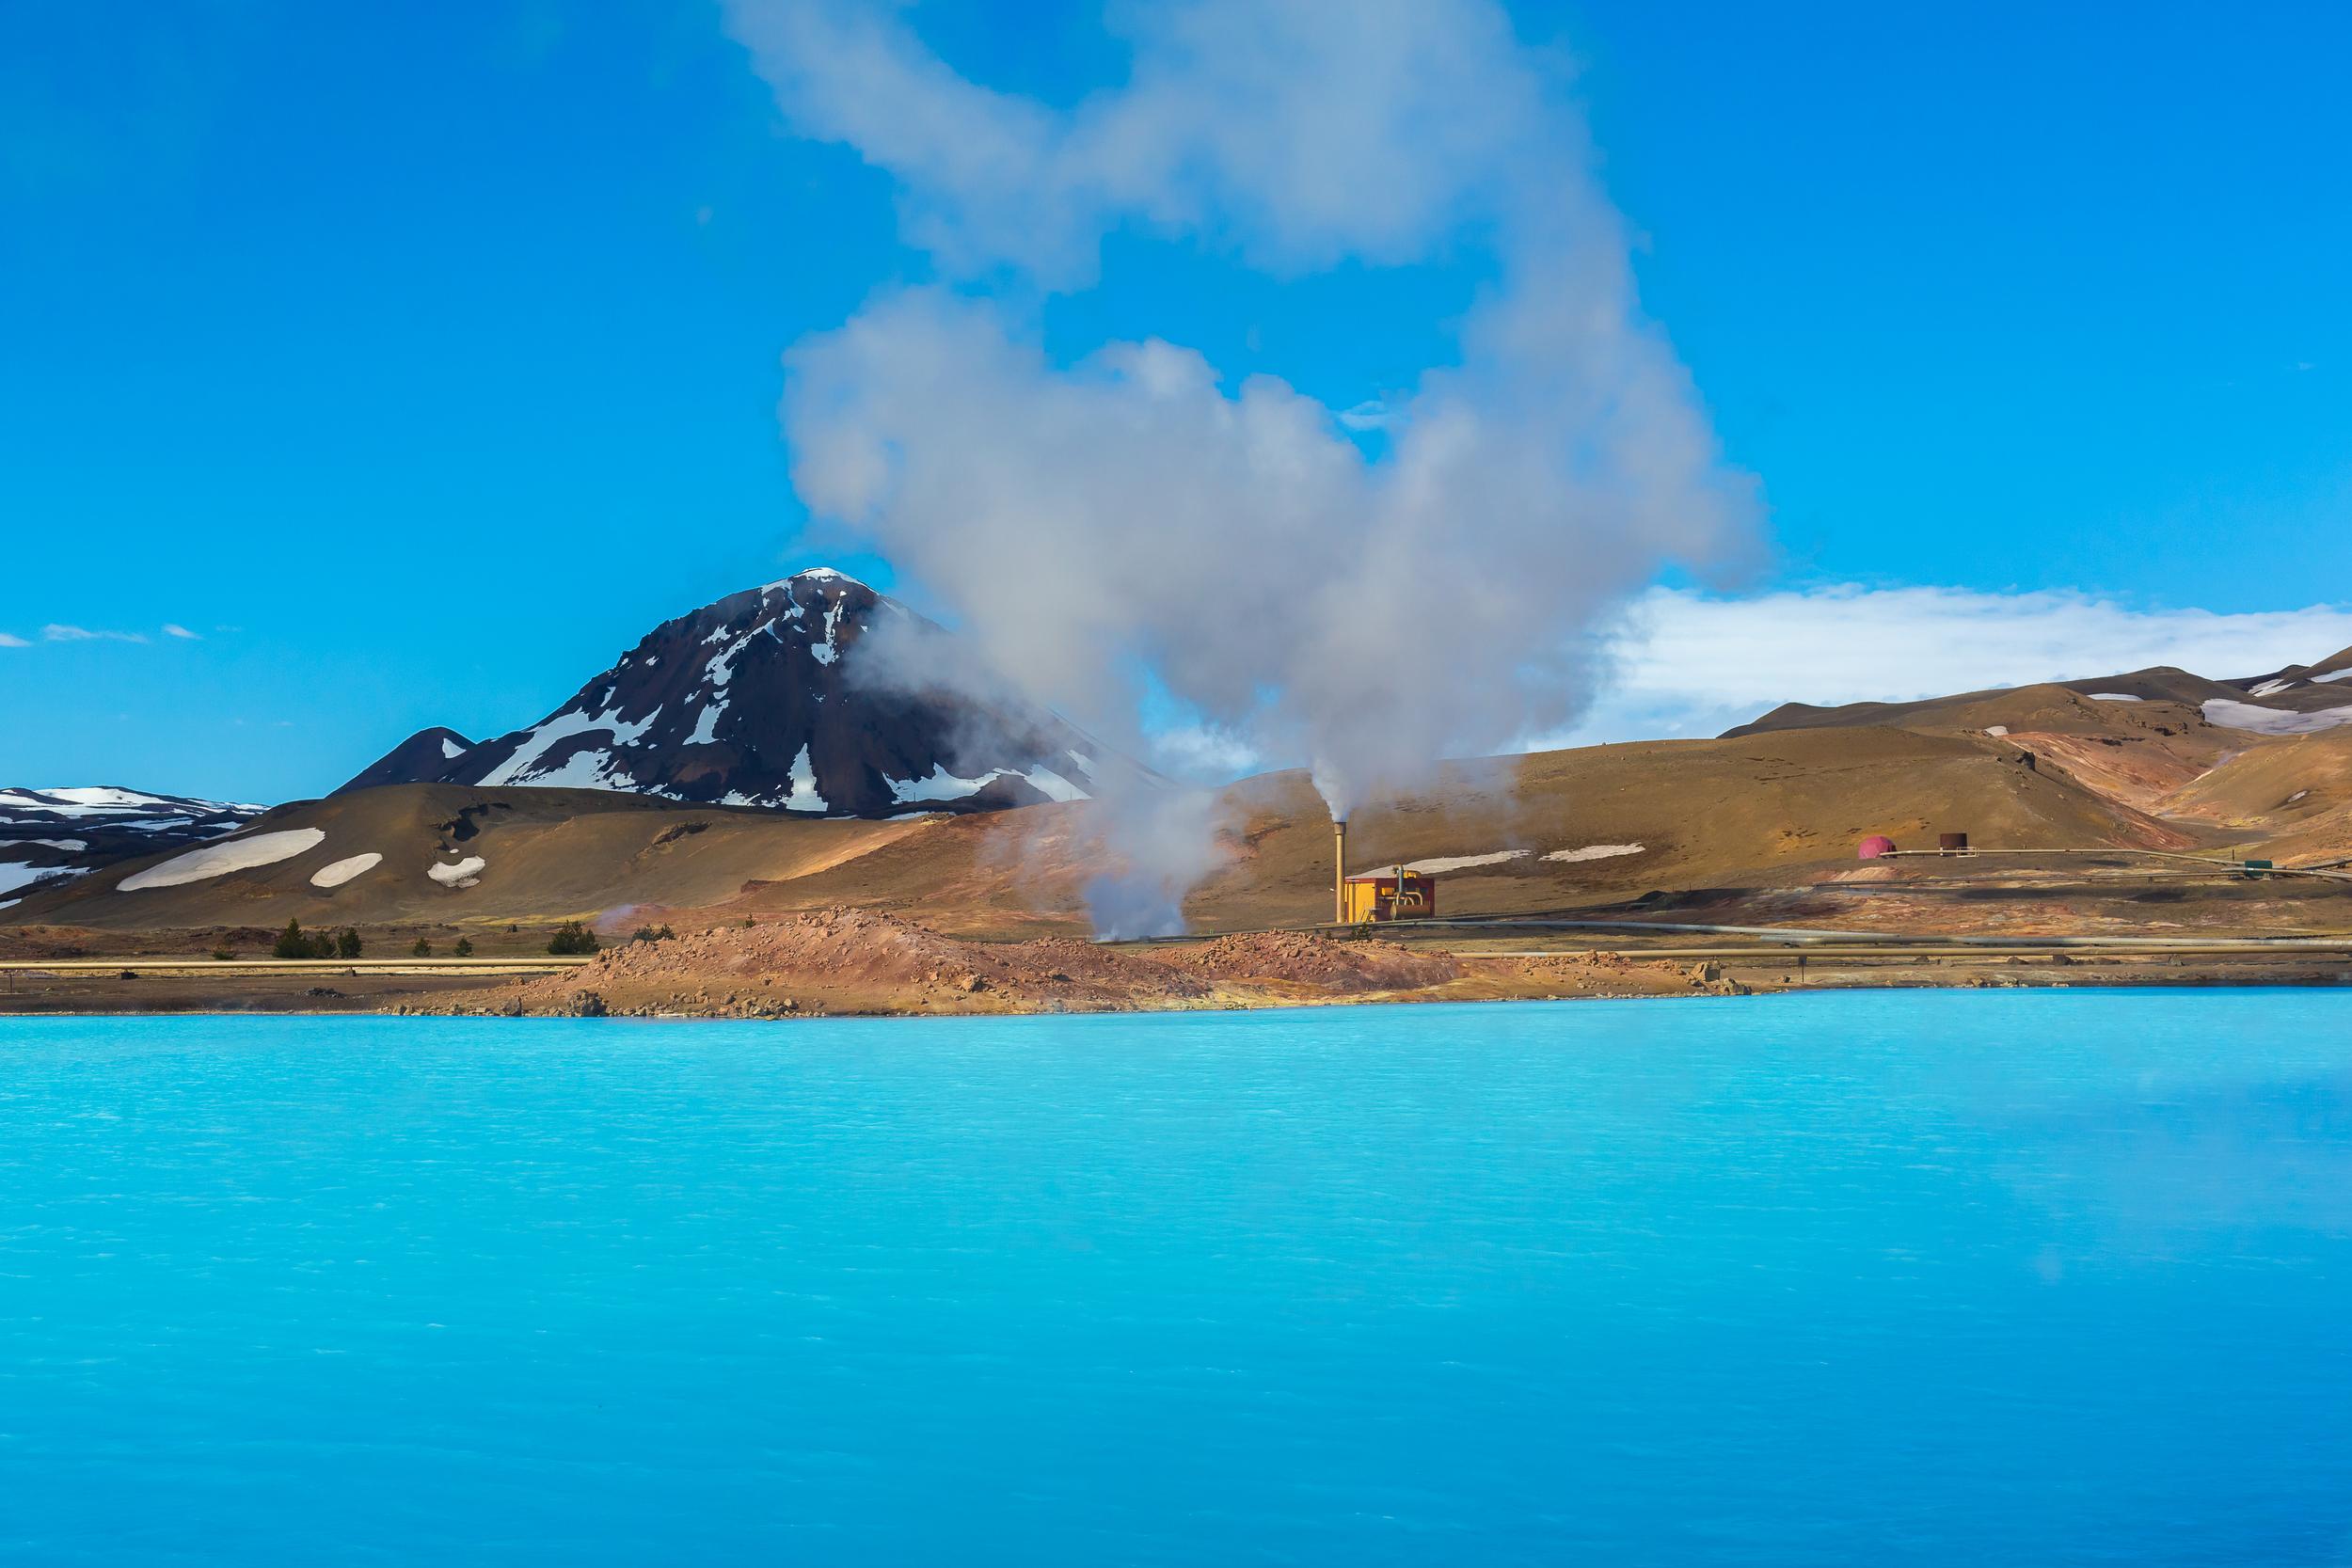 Iceland_20140516_Myvatn and krafla-47.jpg